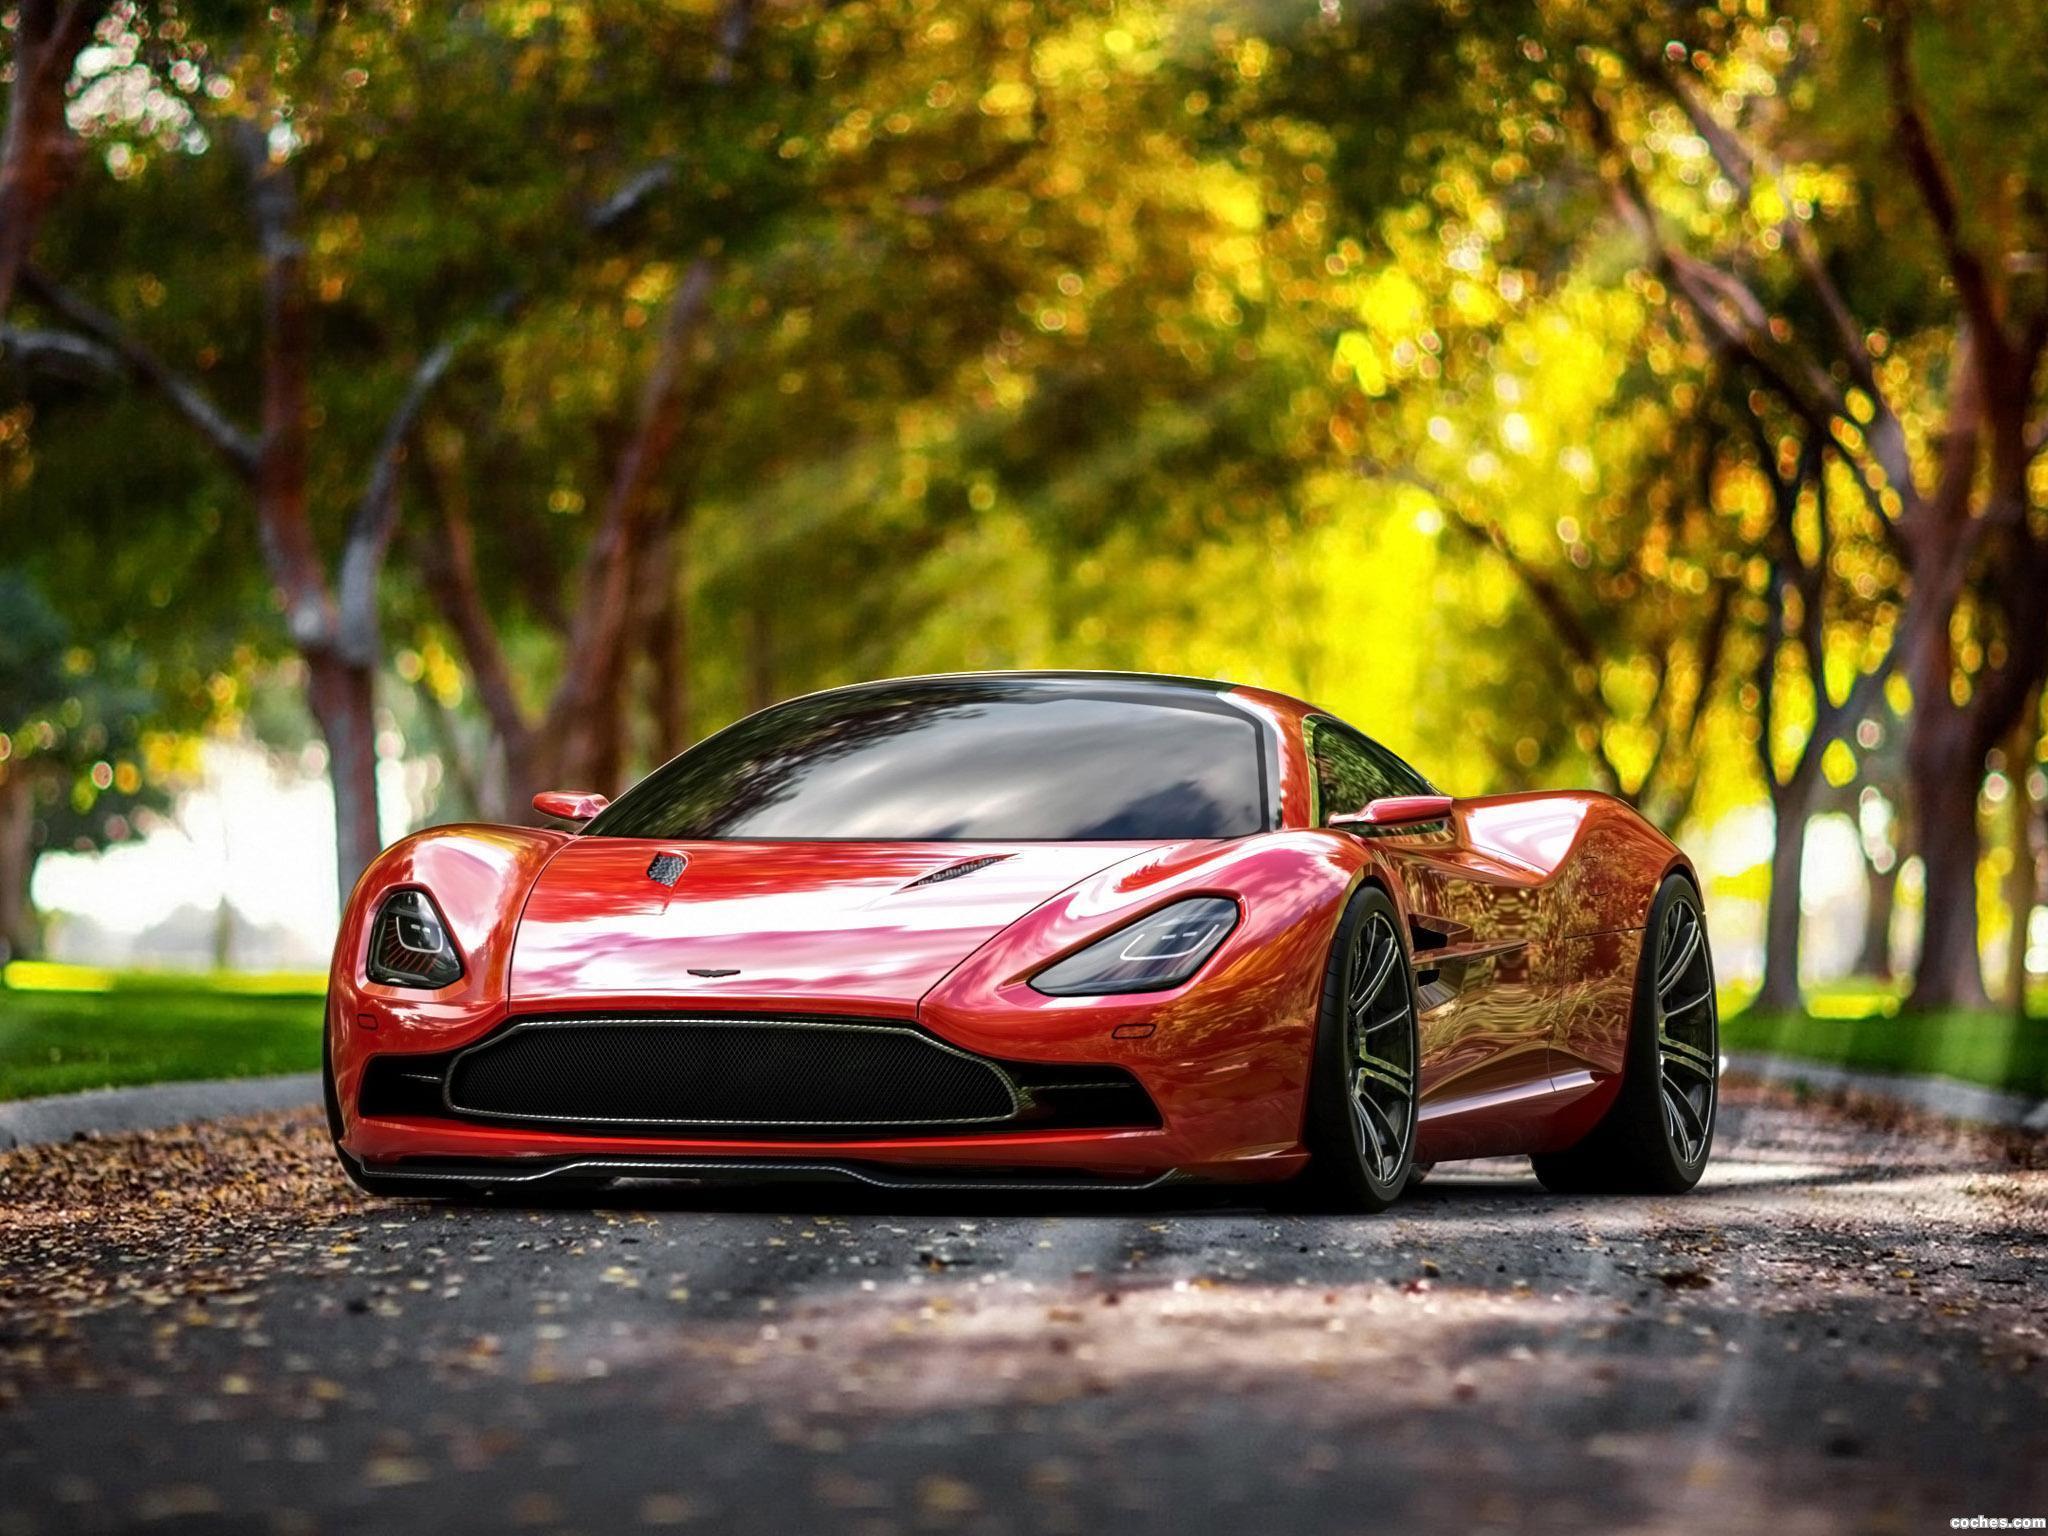 Foto 0 de Aston Martin DBC Concept Design by Samir Sadikhov 2013